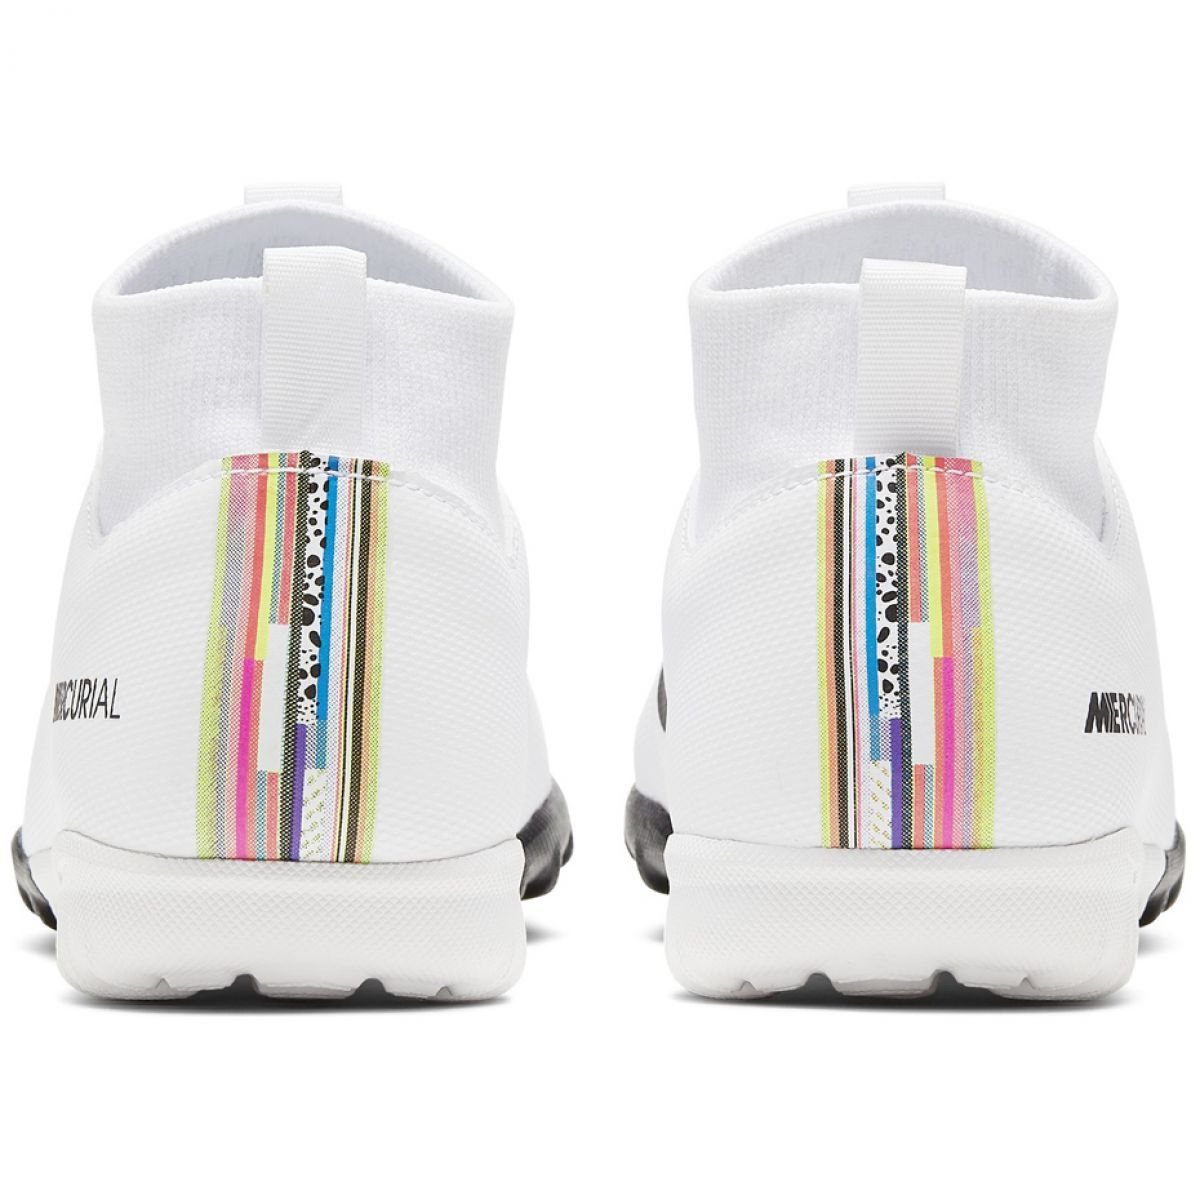 Buty Pilkarskie Nike Mercurial Superfly X 6 Academy Tf Jr Aj3112 109 Biale Wielokolorowe Football Boots Superfly Nike